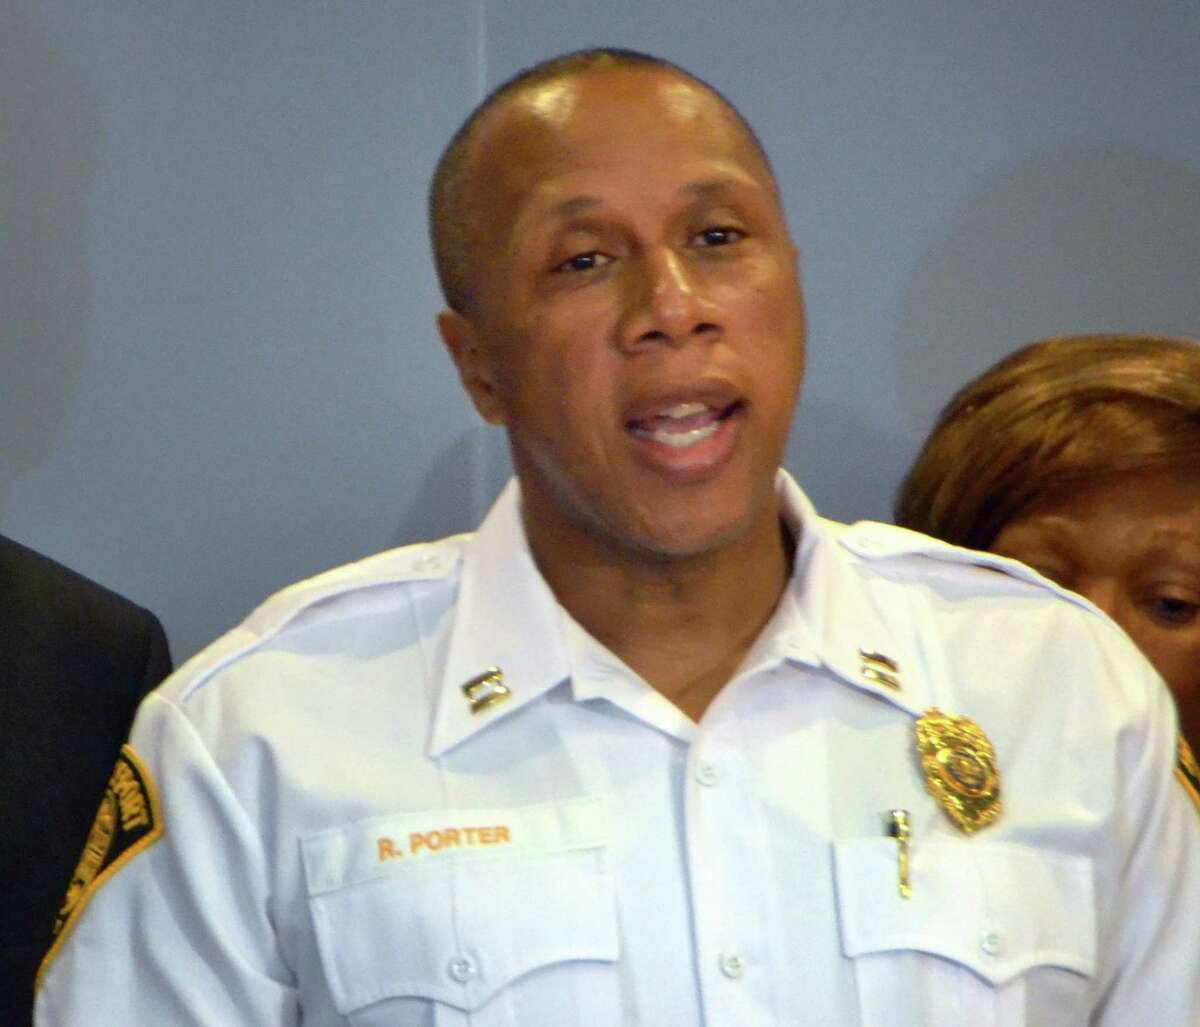 Bridgeport Police Captain Roderick Porter.